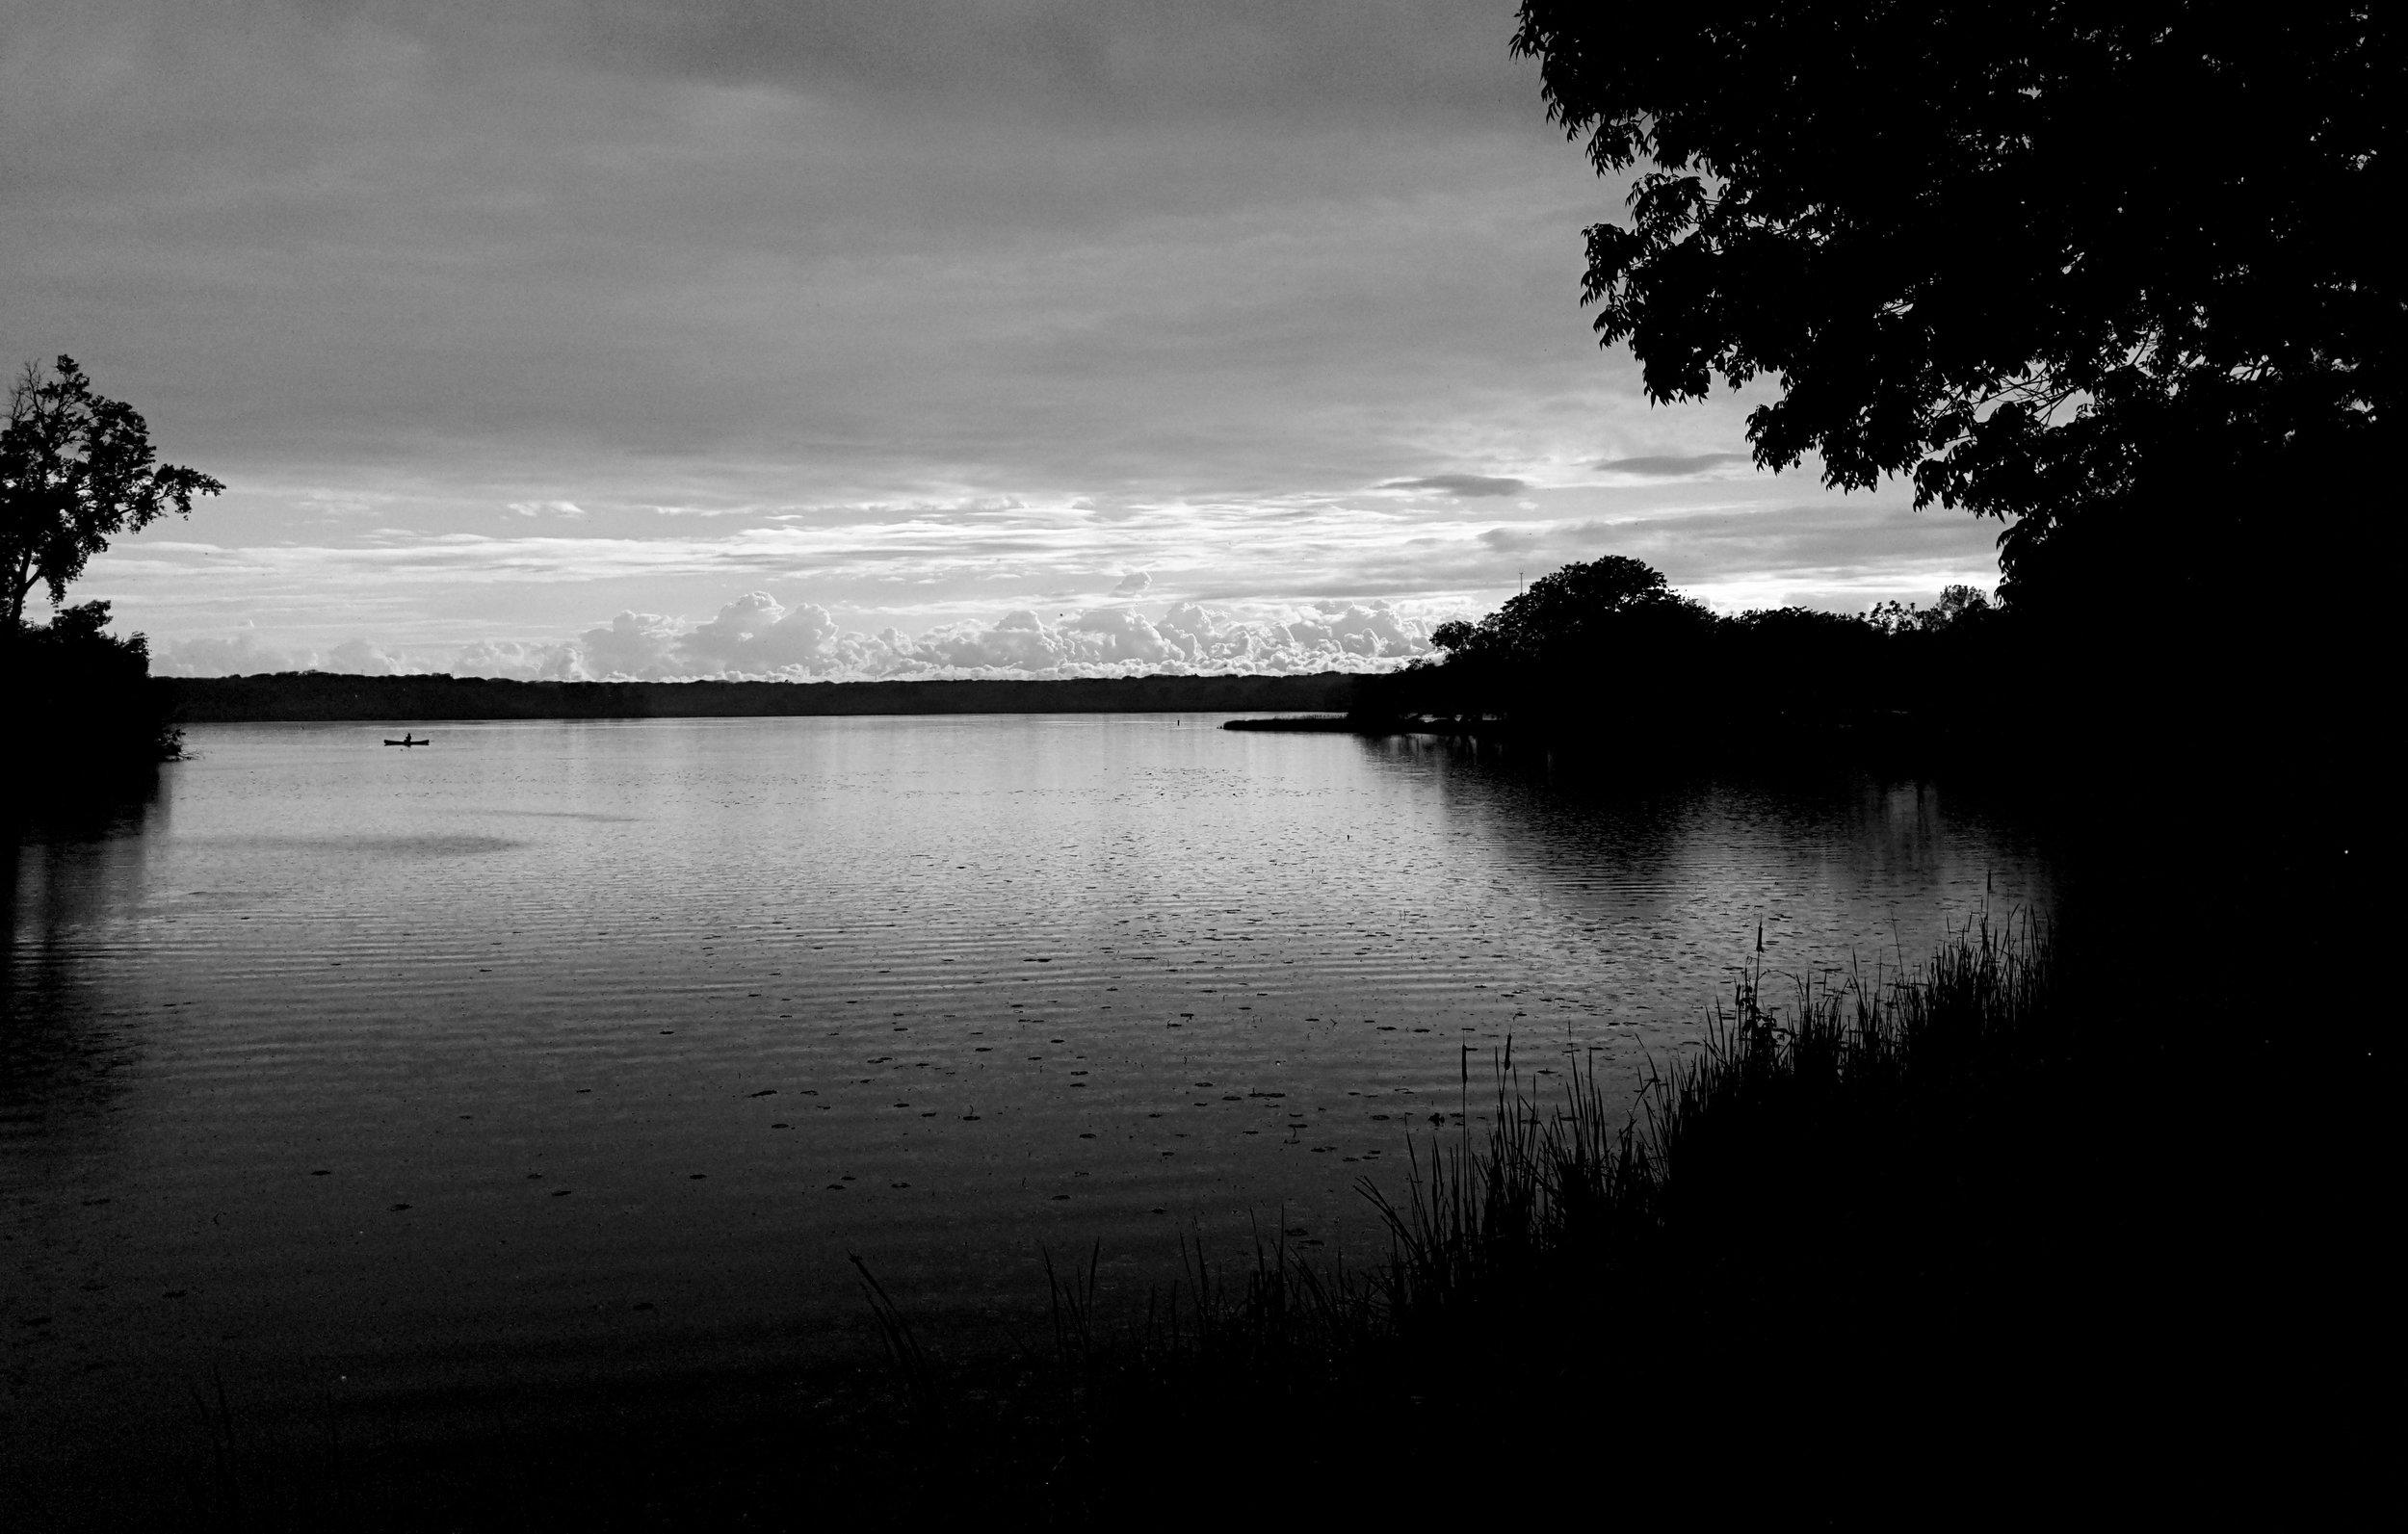 Canoe. Lake Wingra. Madison, Wisconsin. May 2017. © William D. Walker